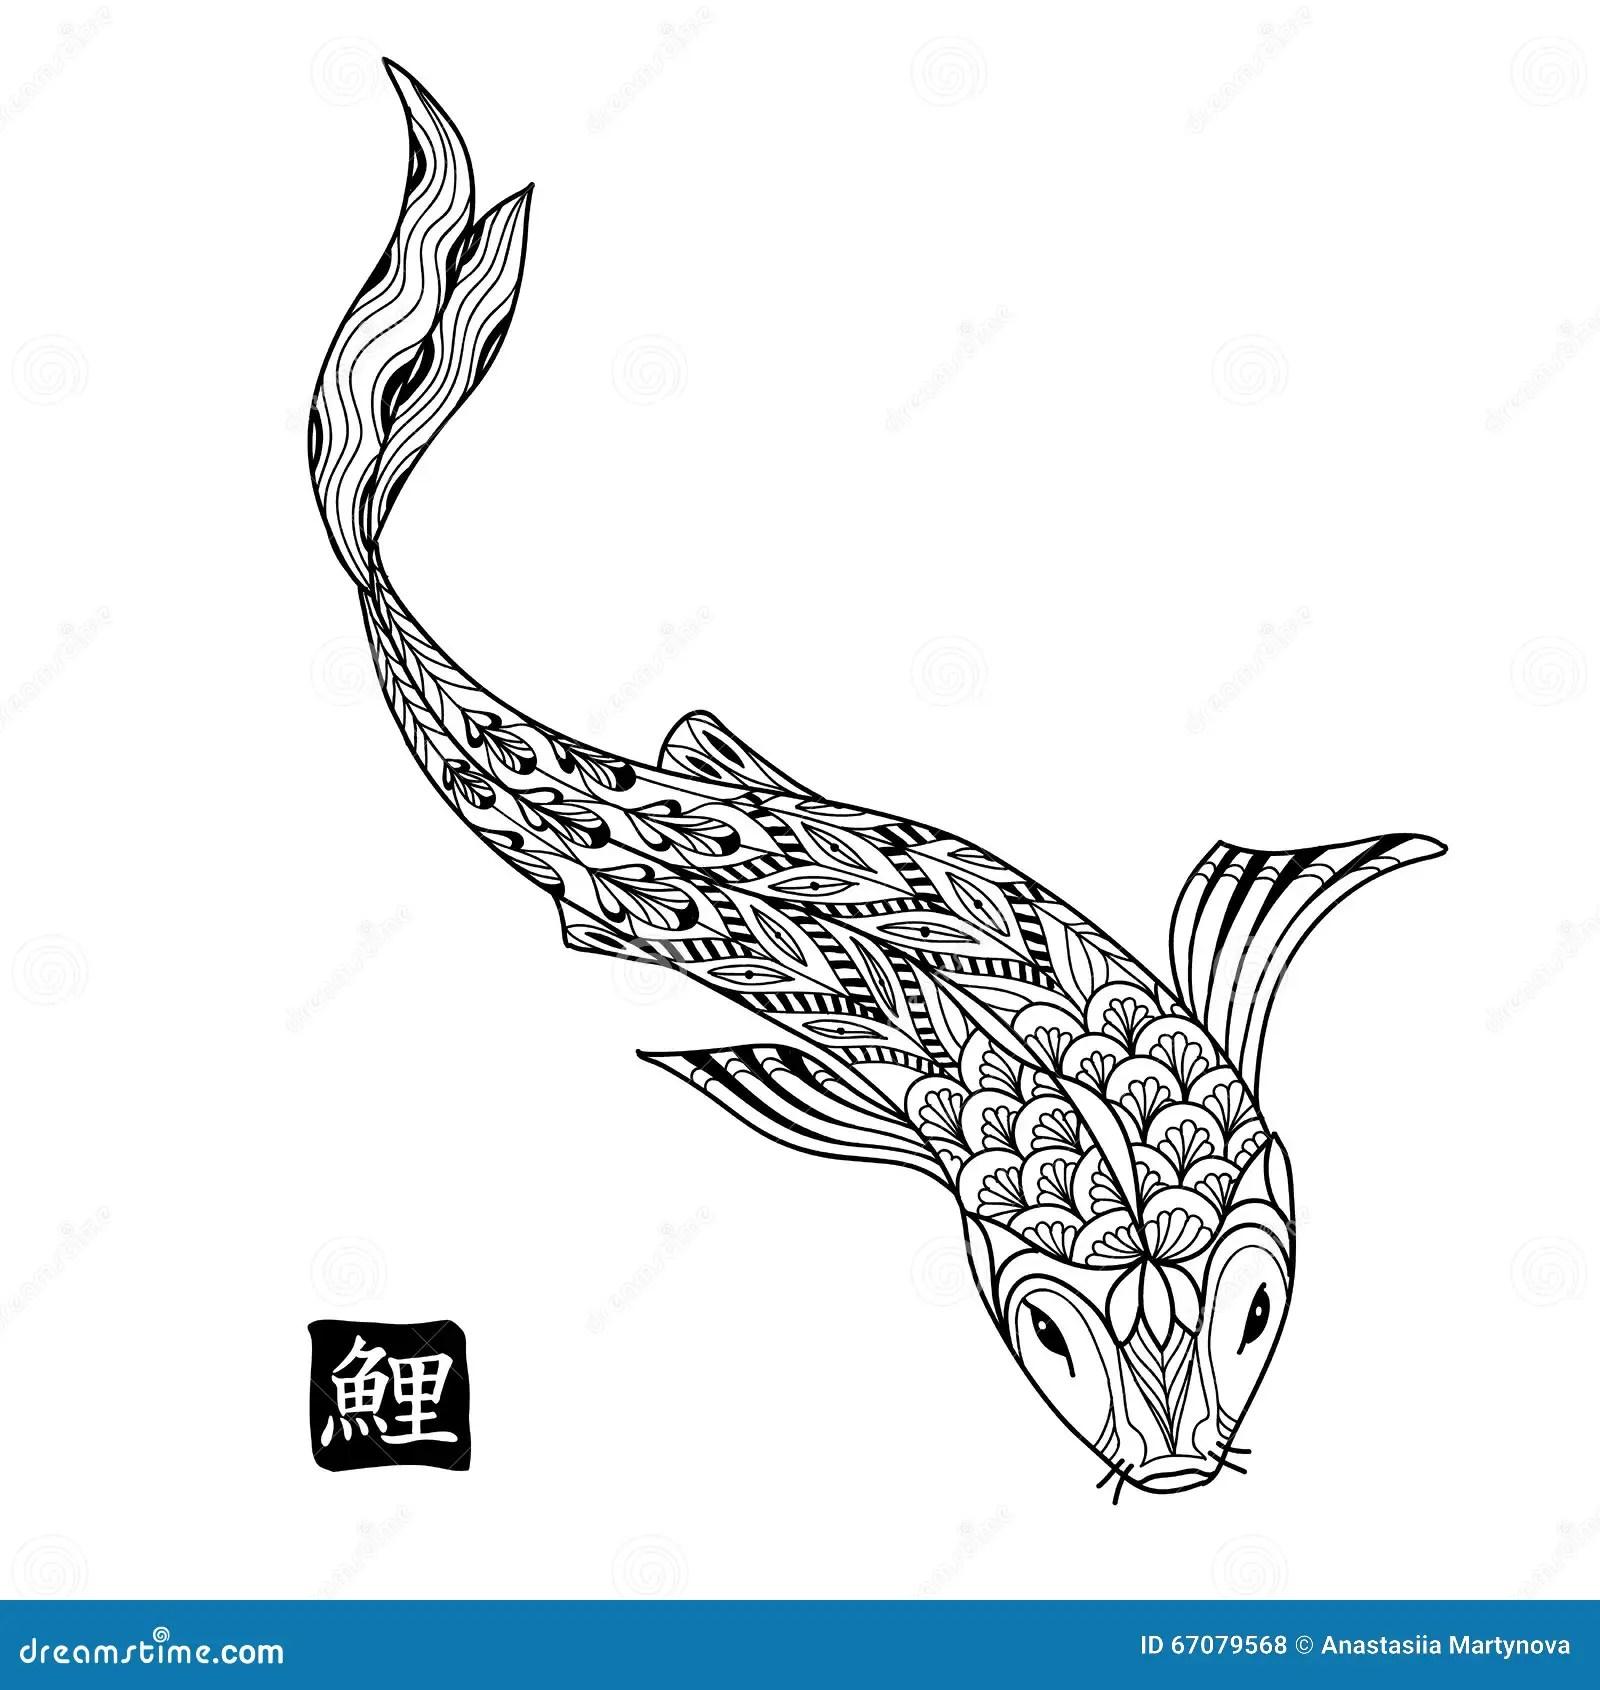 Hand Drawn Koi Fish Japanese Carp Line Drawing For